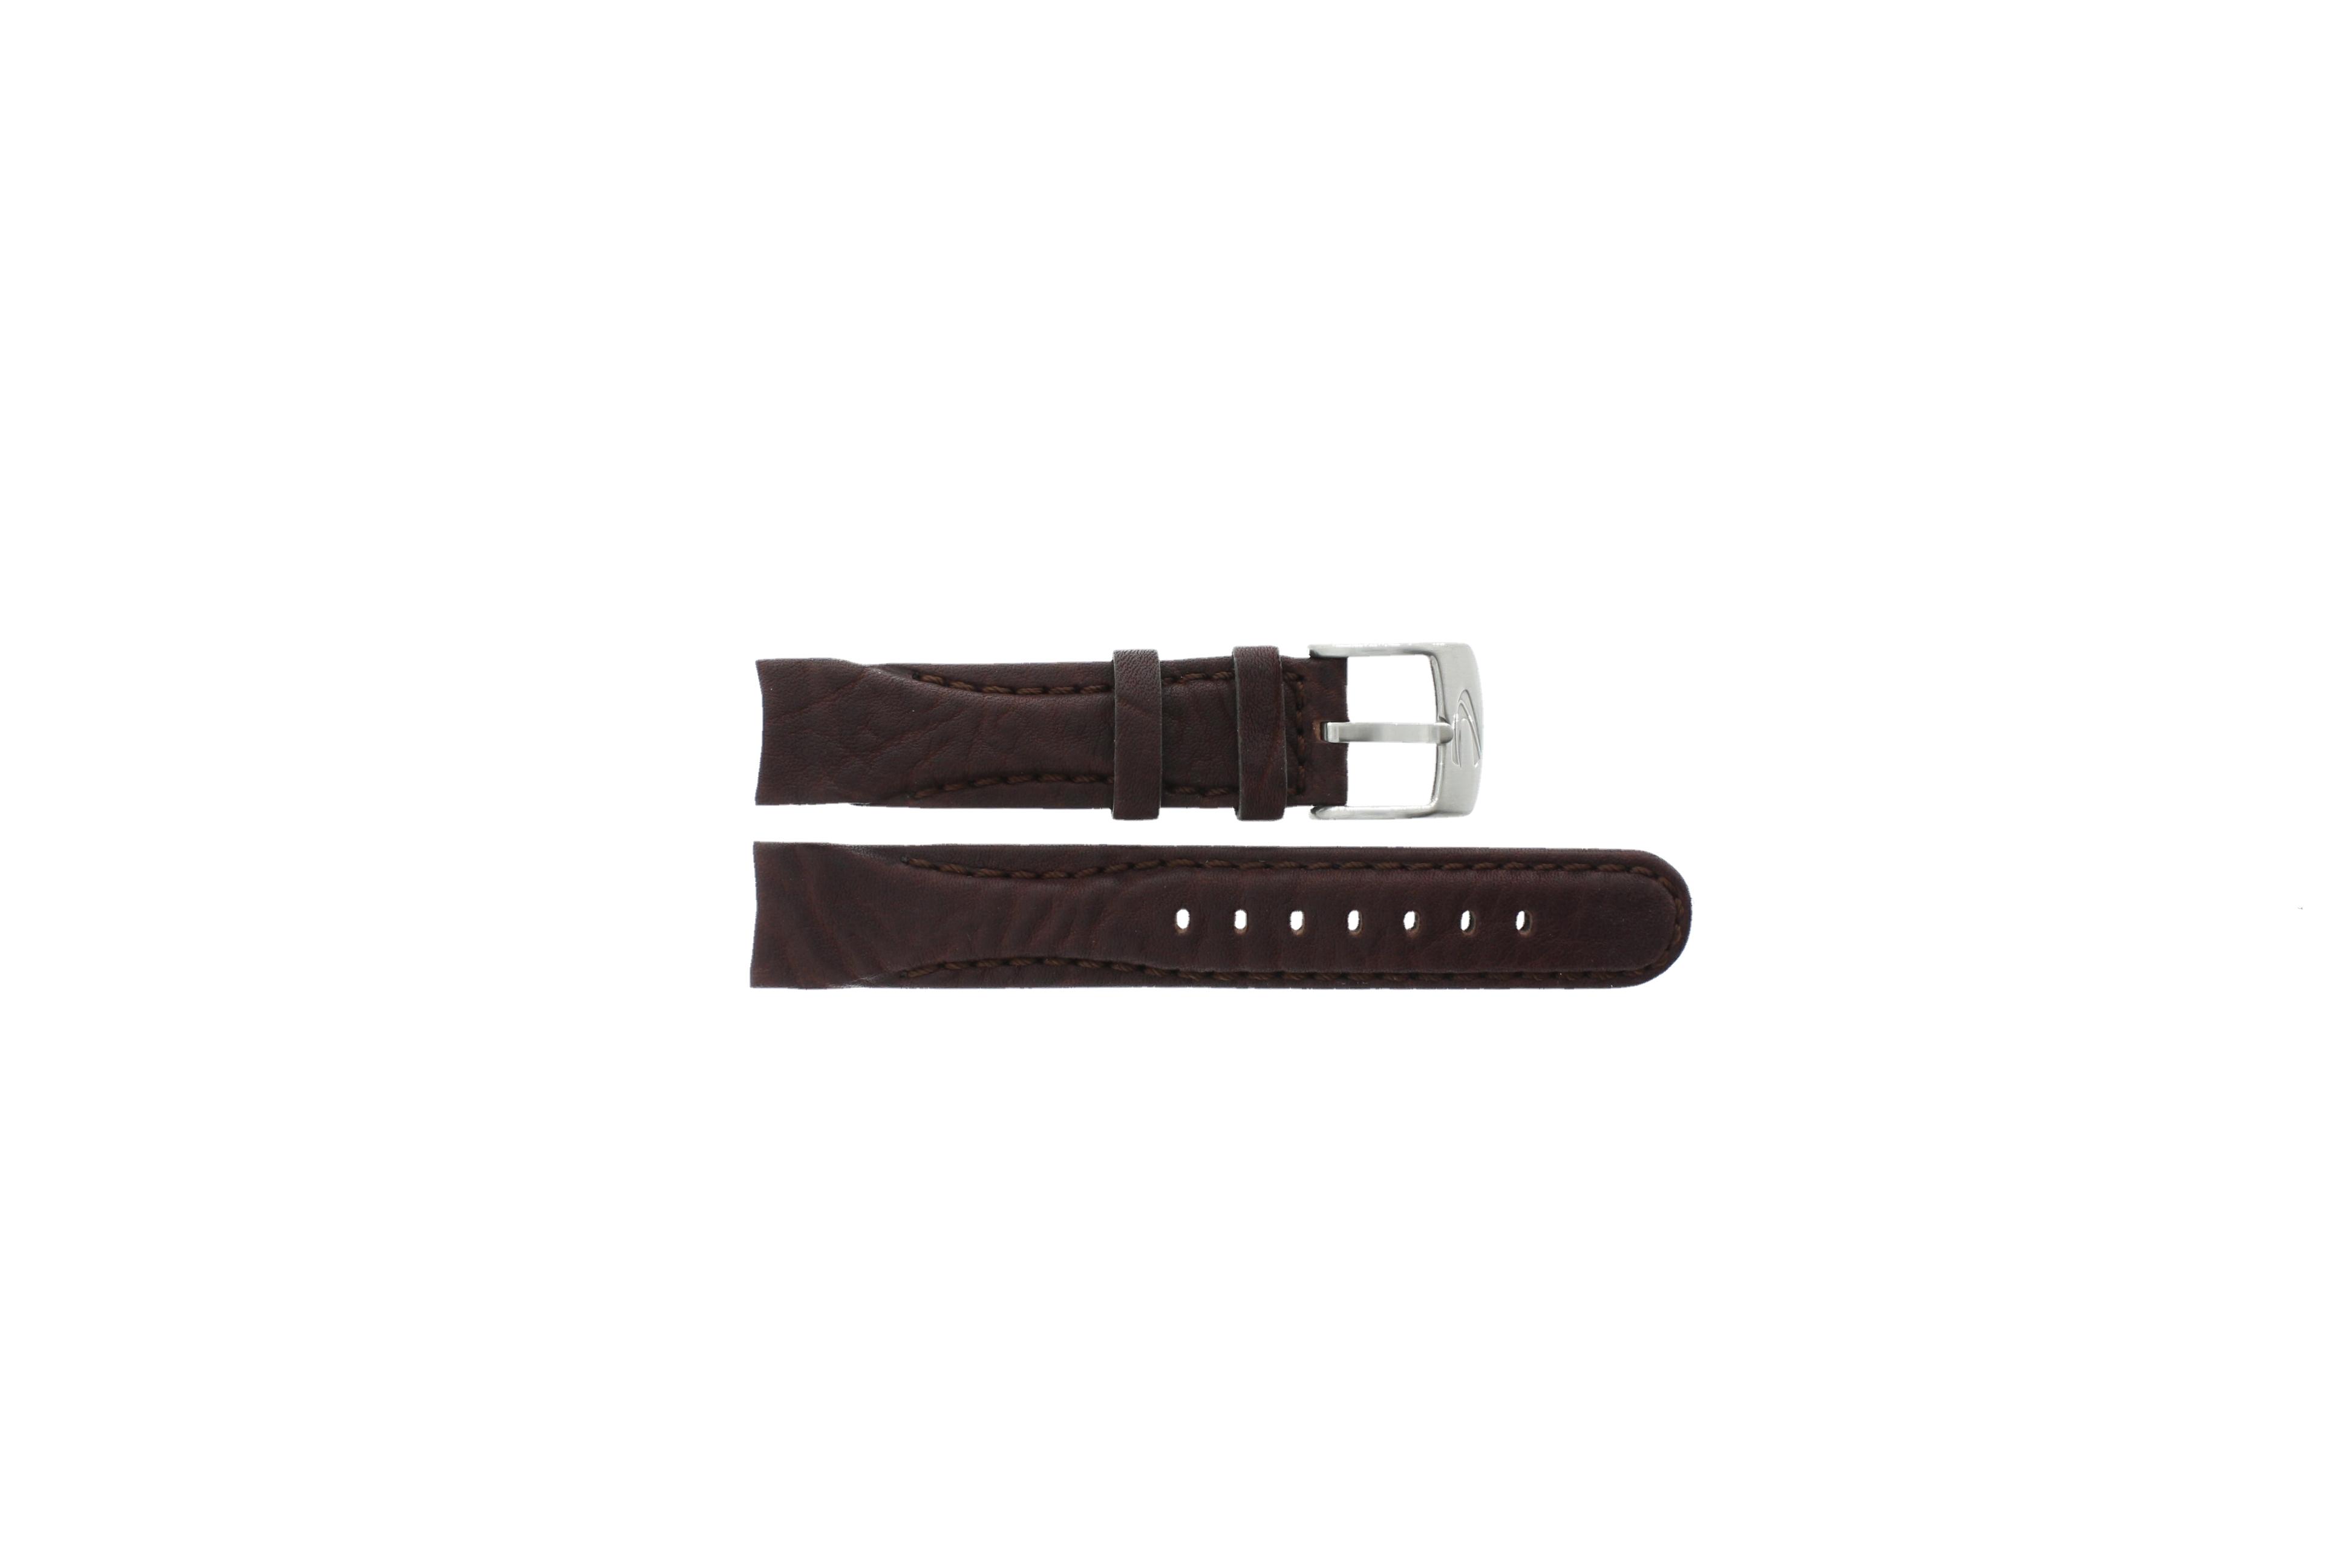 Camel horlogeband 4040-4049 / 4050-4059 Leder Bruin 23mm + bruin stiksel